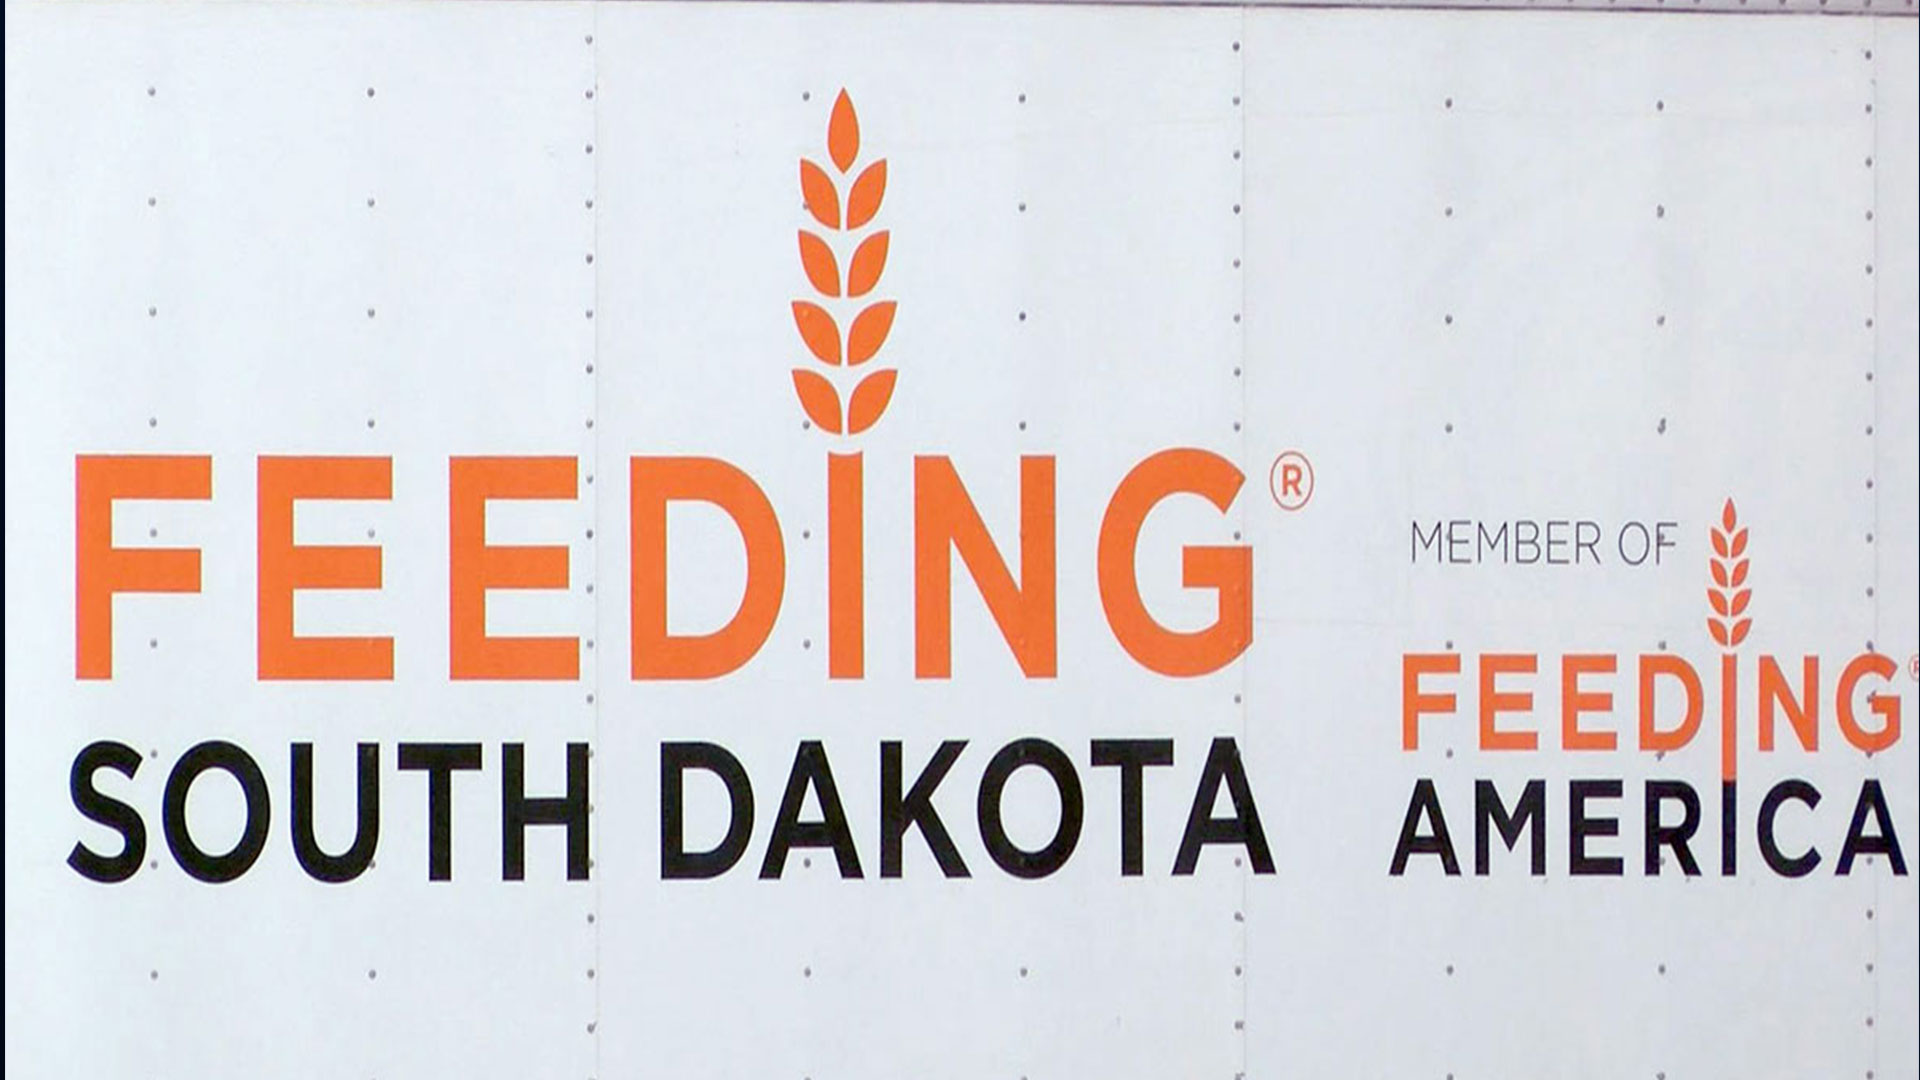 KELO Feeding South Dakota